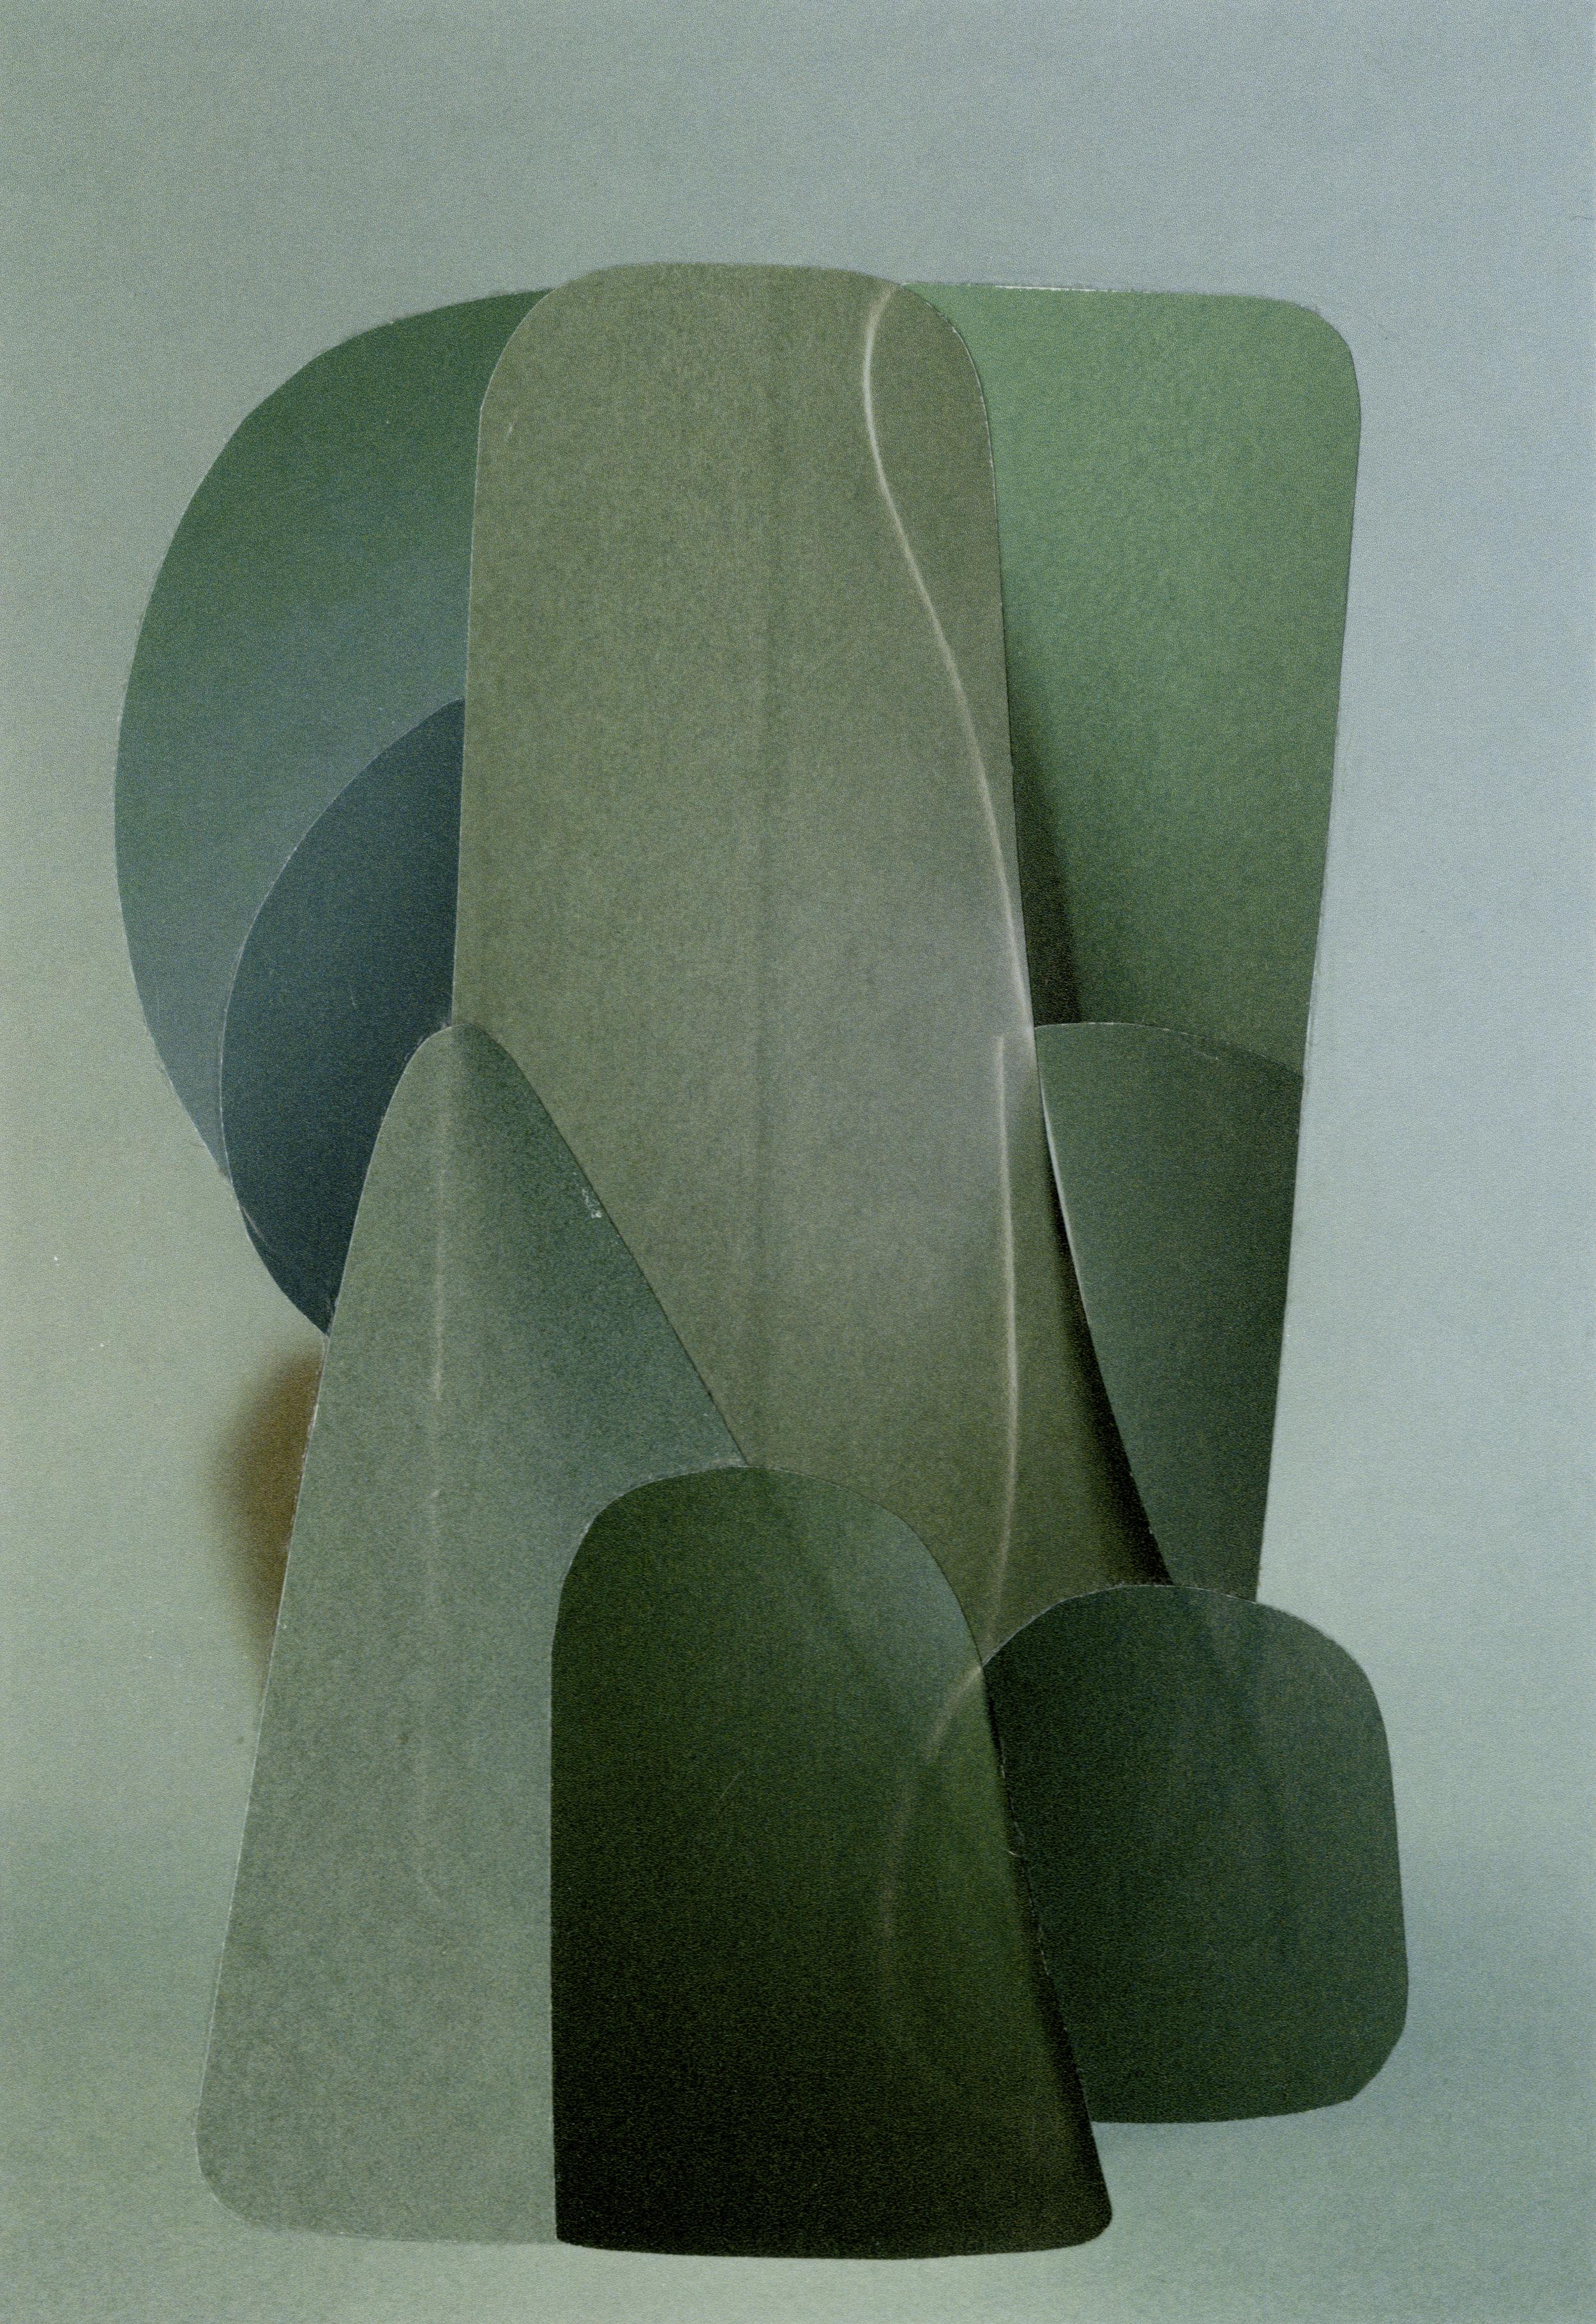 Mirror Image #18, Flatland Series, Collage (c) Hannah Hughes